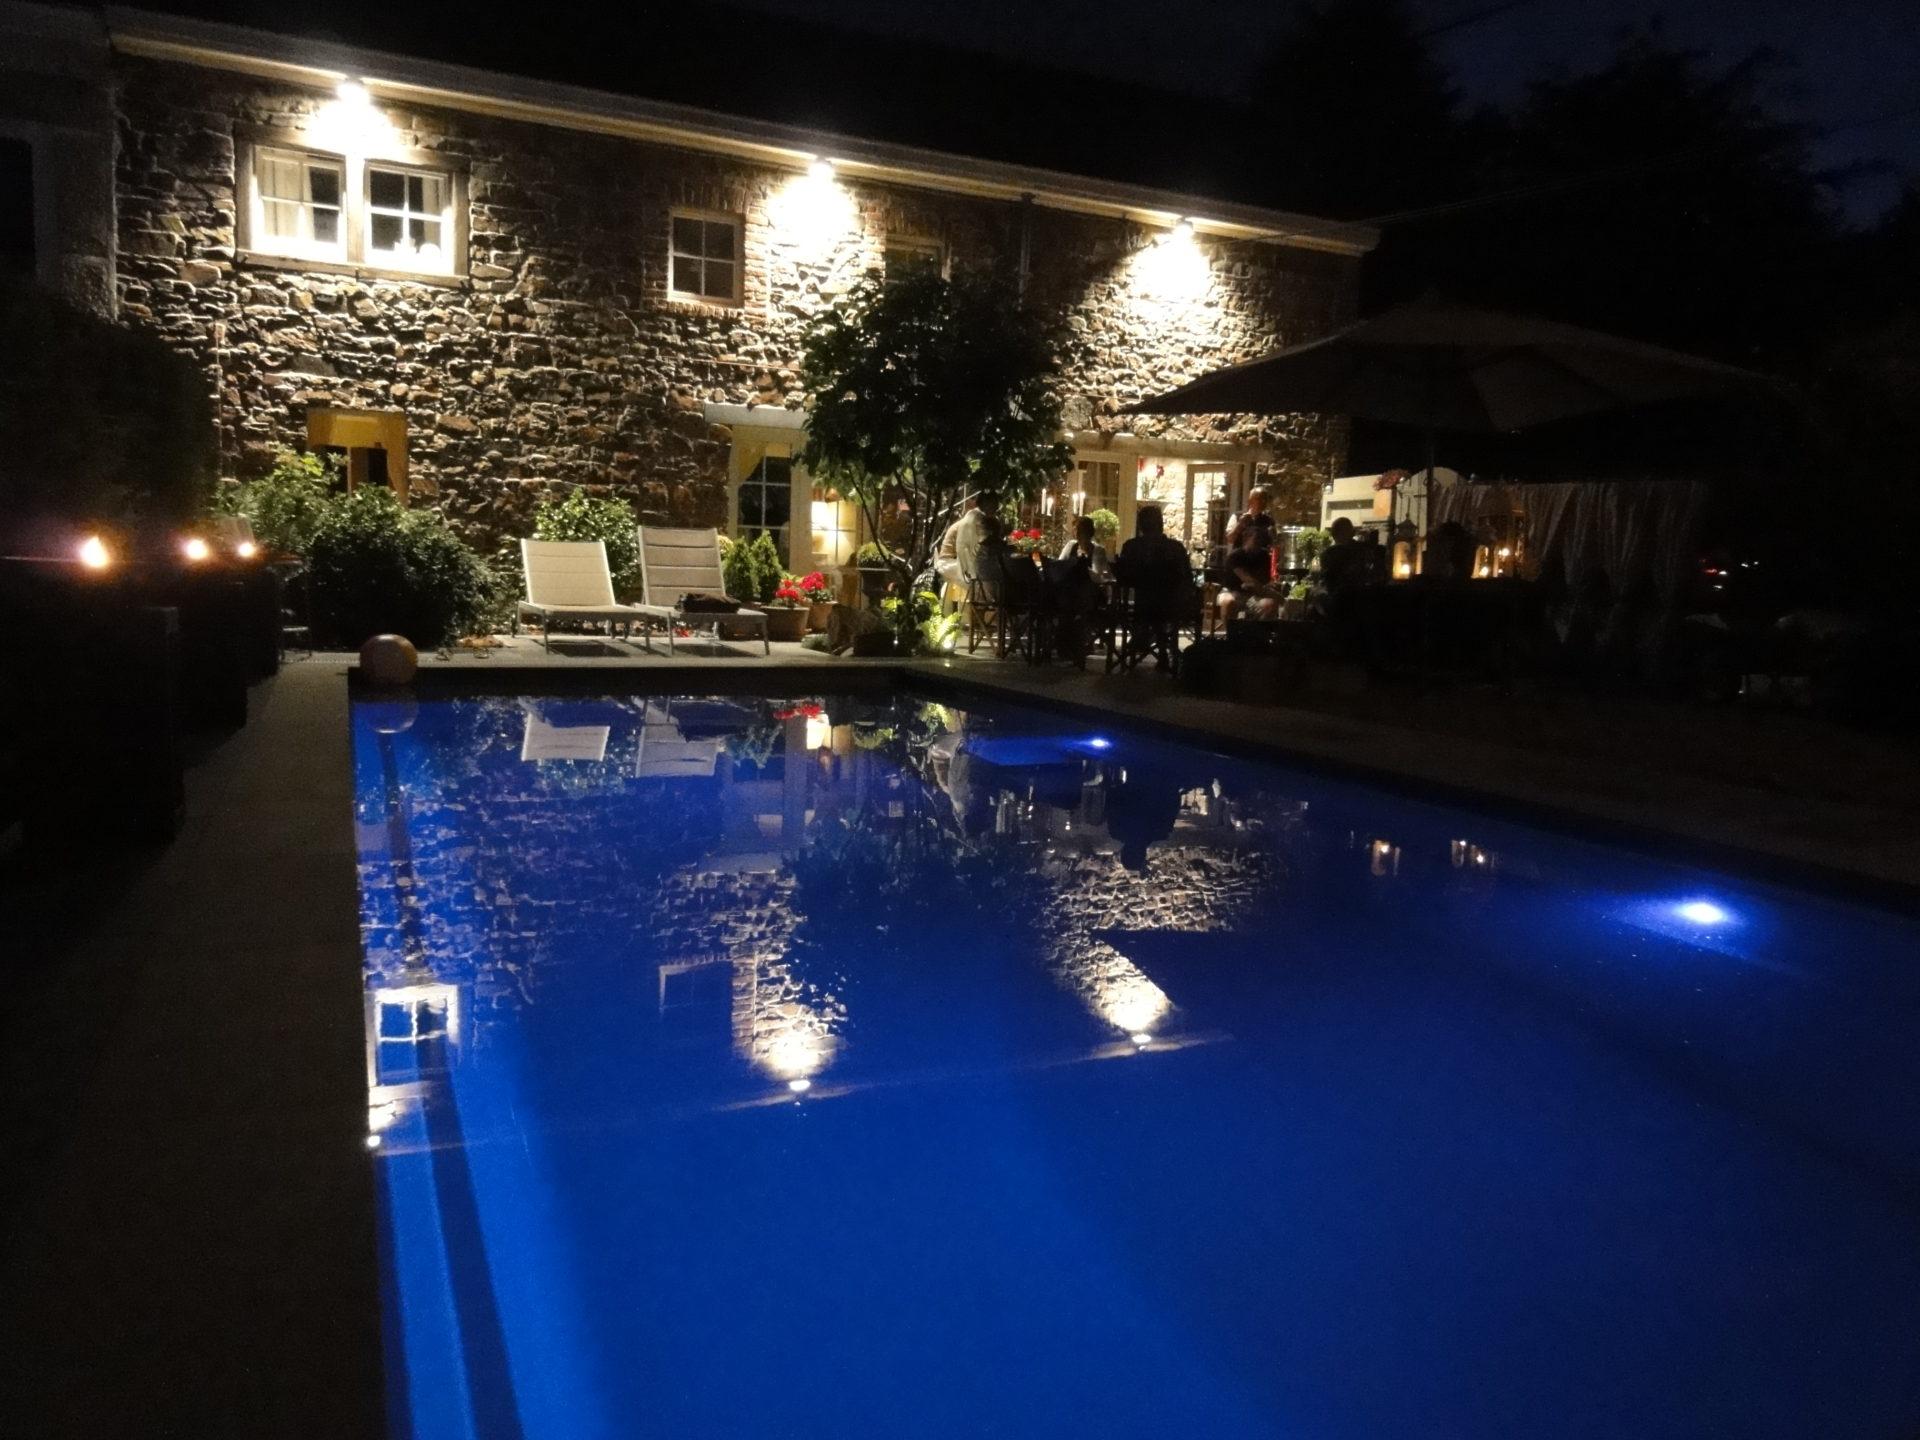 Piscine clair e le soir leisure pools for Piscine leisure pools